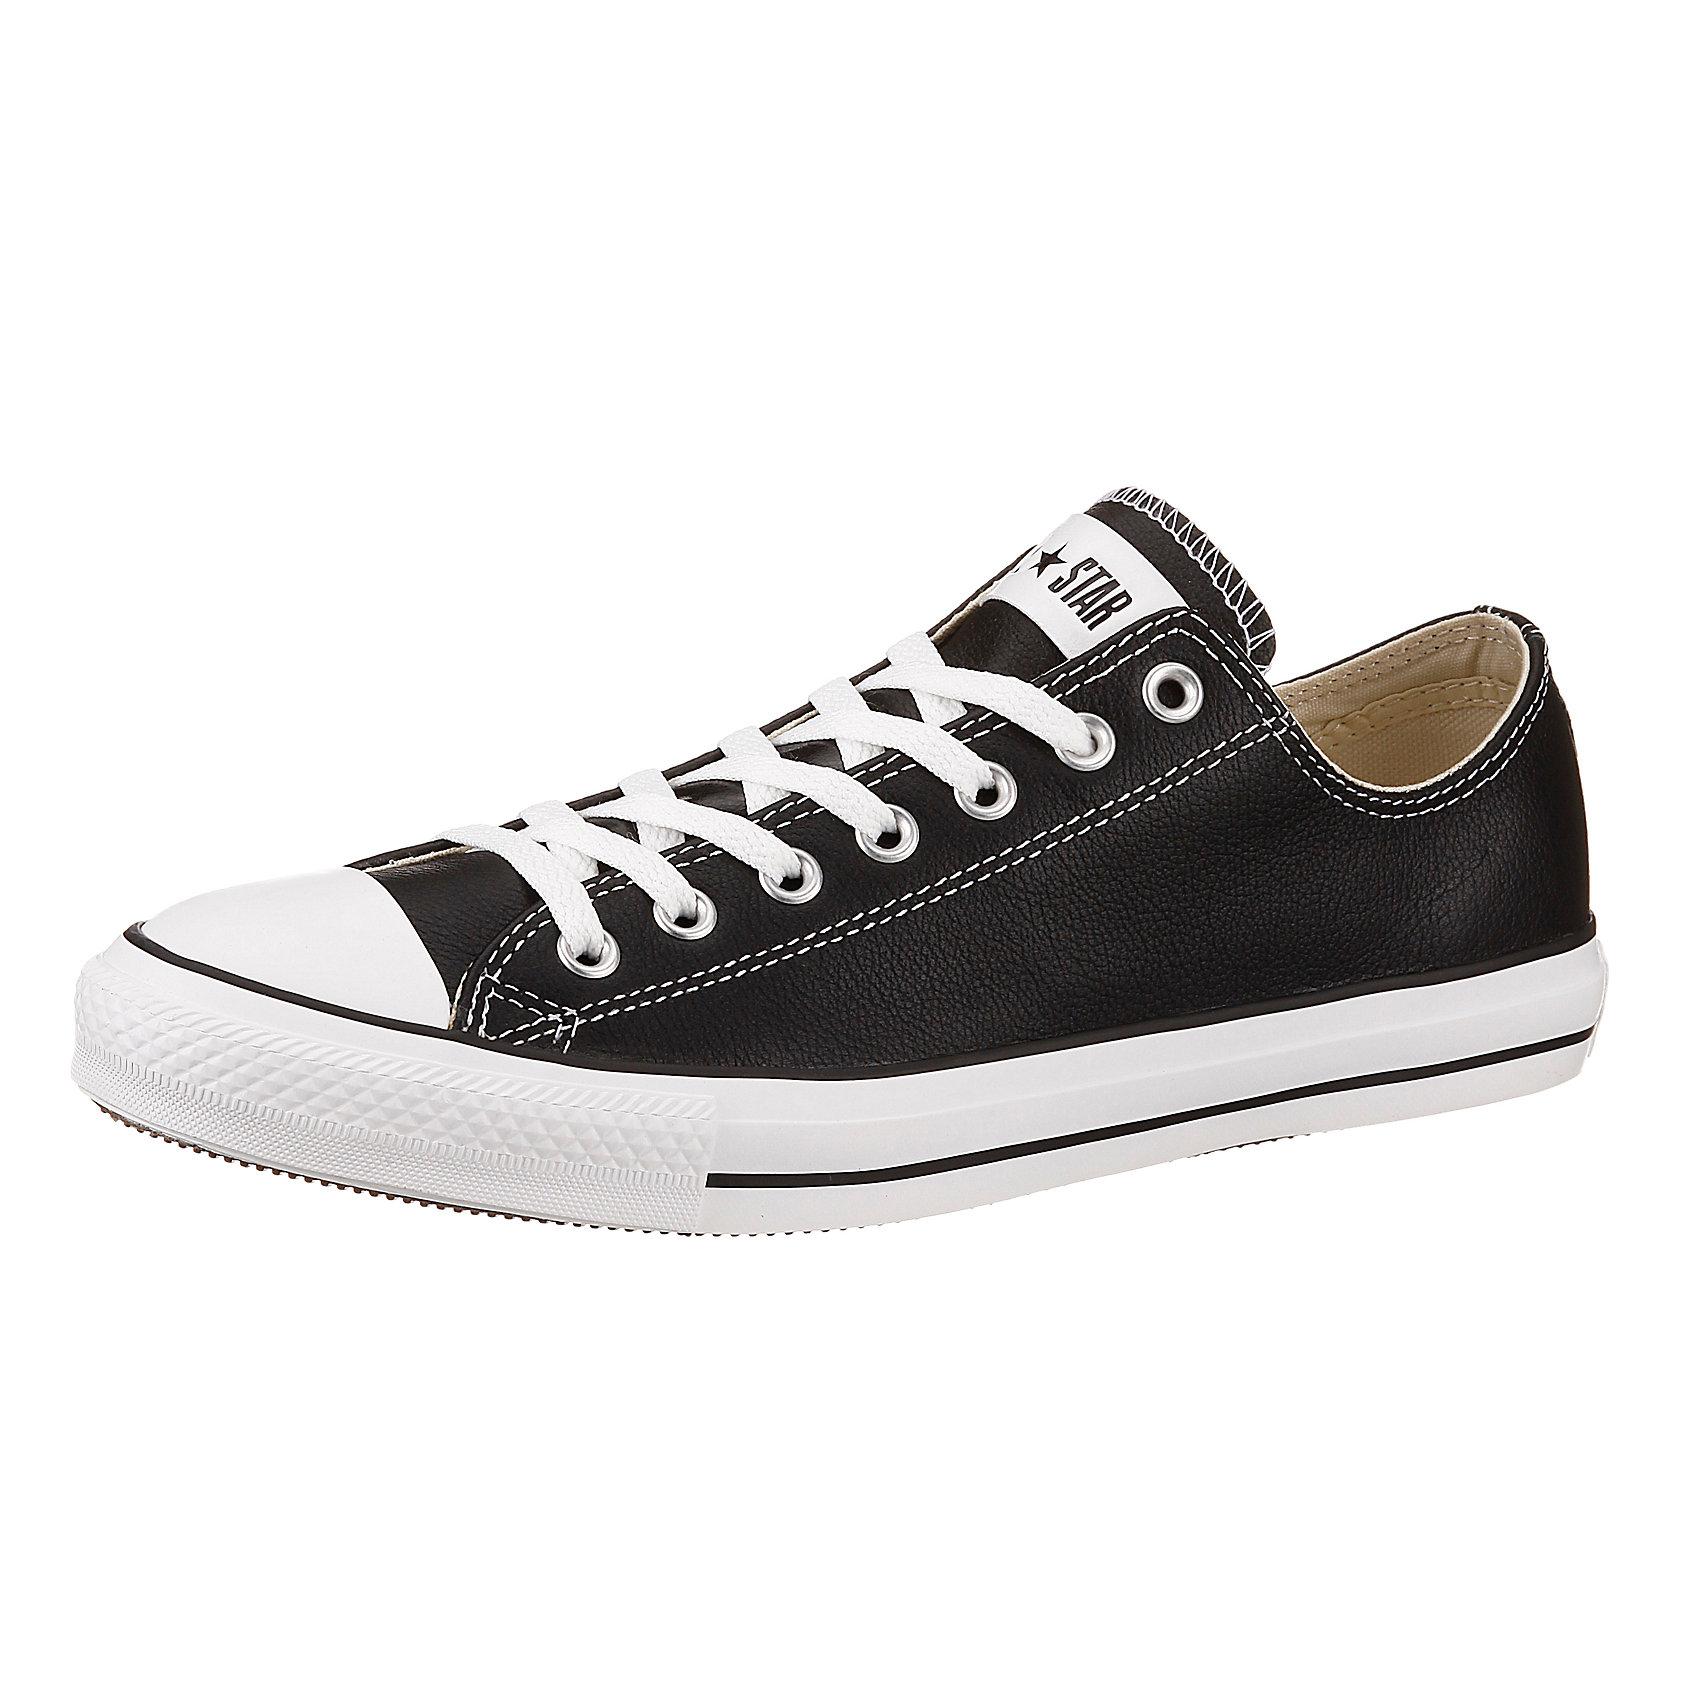 Neu CONVERSE Chuck Taylor All Star Ox Sneakers 5731372 f r Damen schwarz